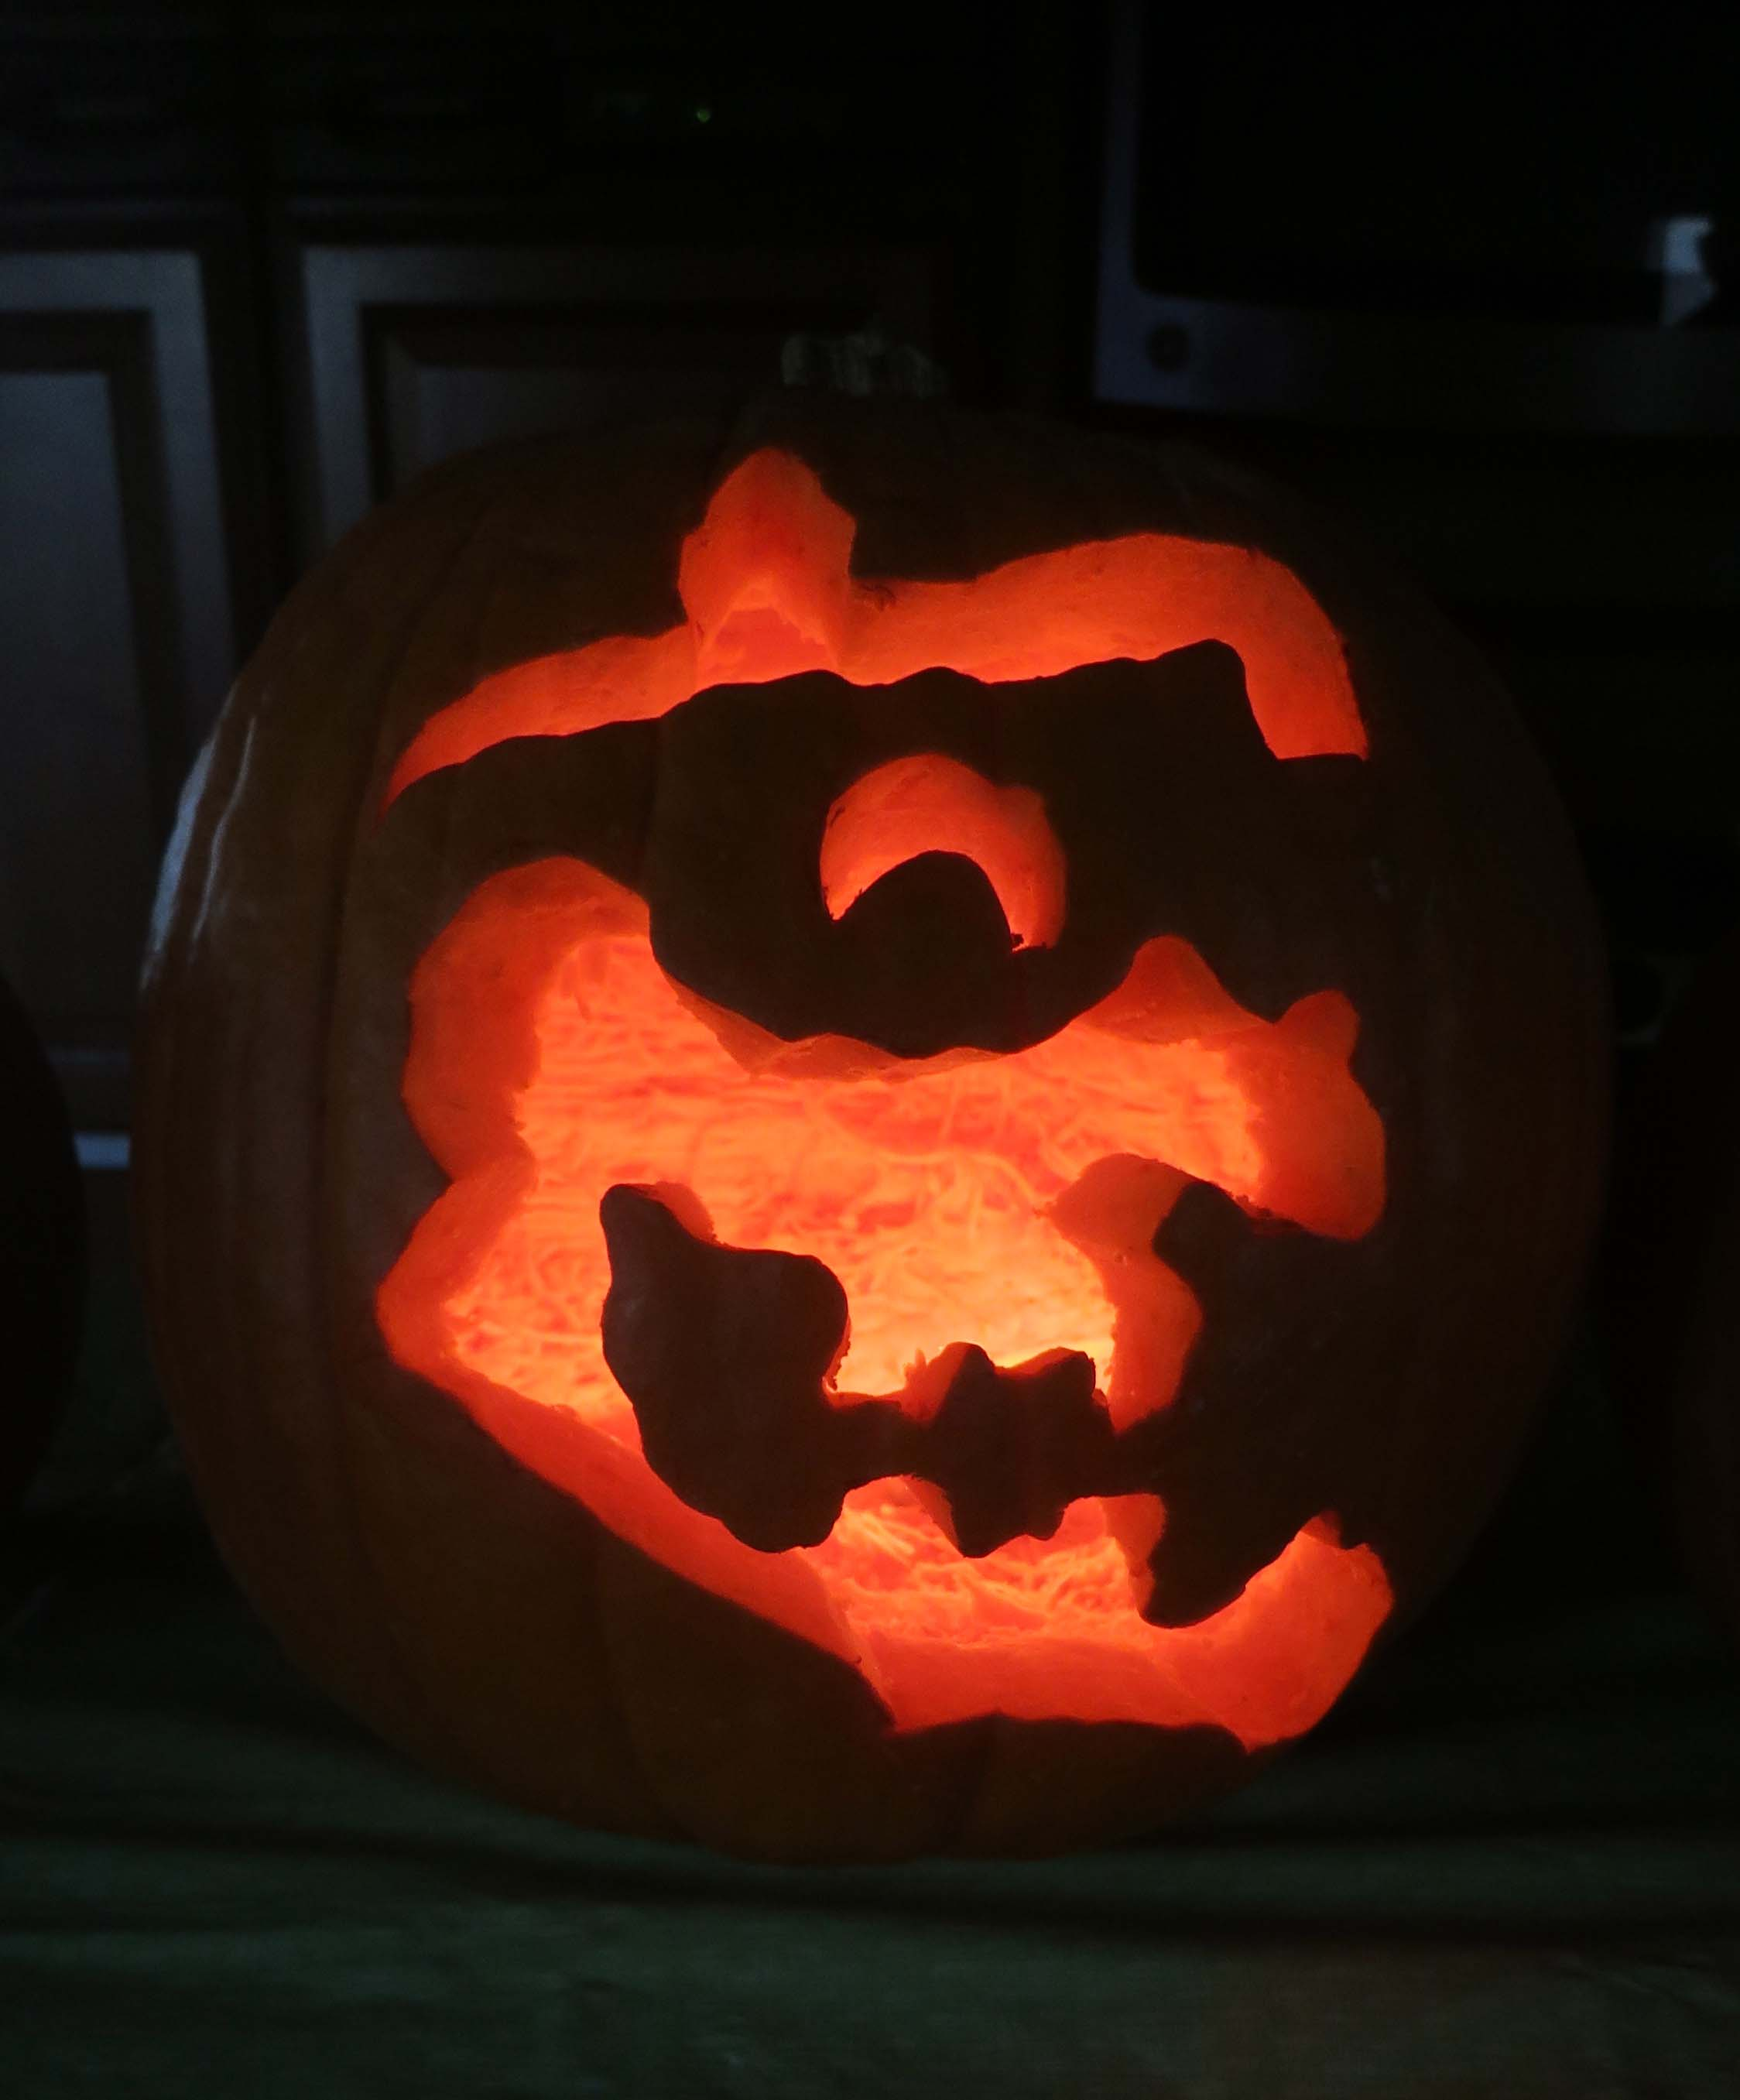 Pumpkin carving photo by Curtis Mekemson.